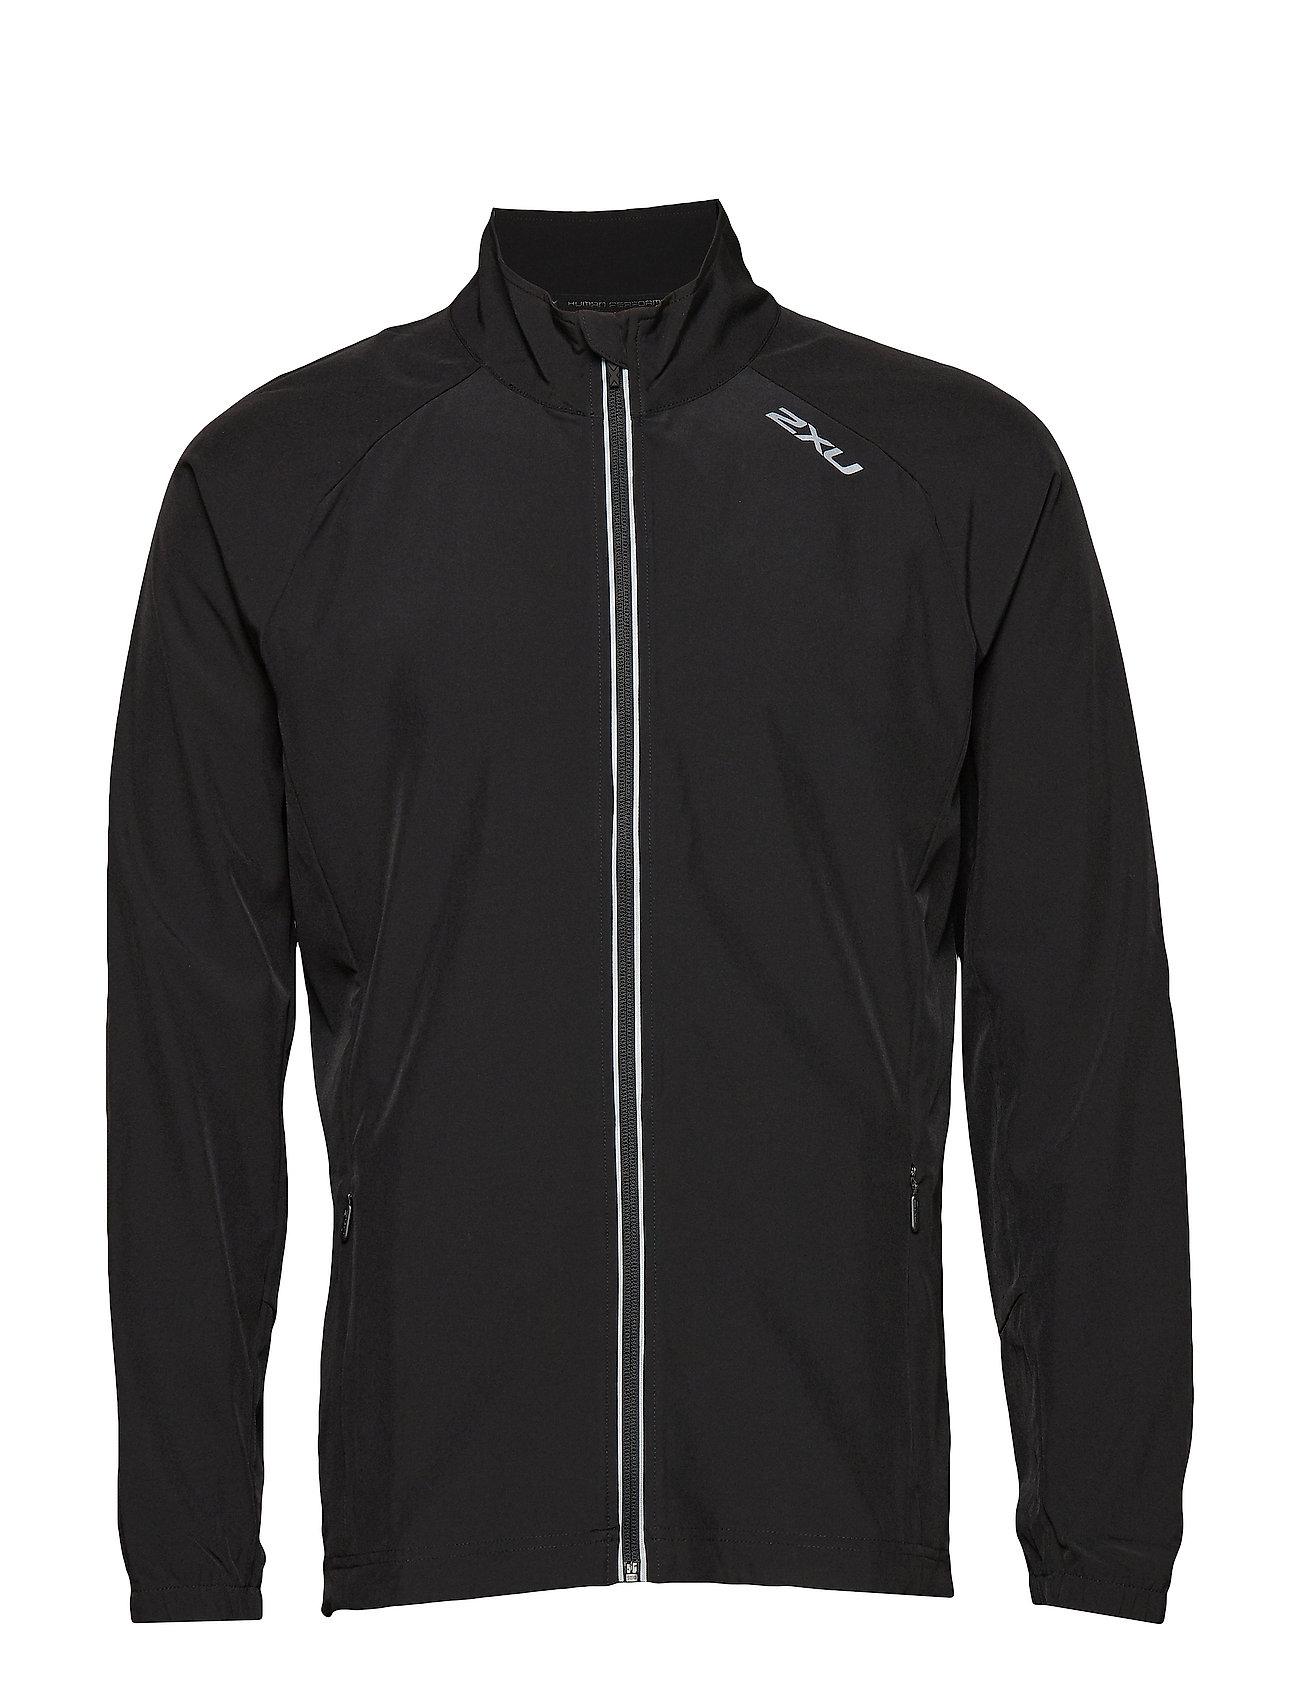 2XU X VENT Run Jacket M Ytterkläder